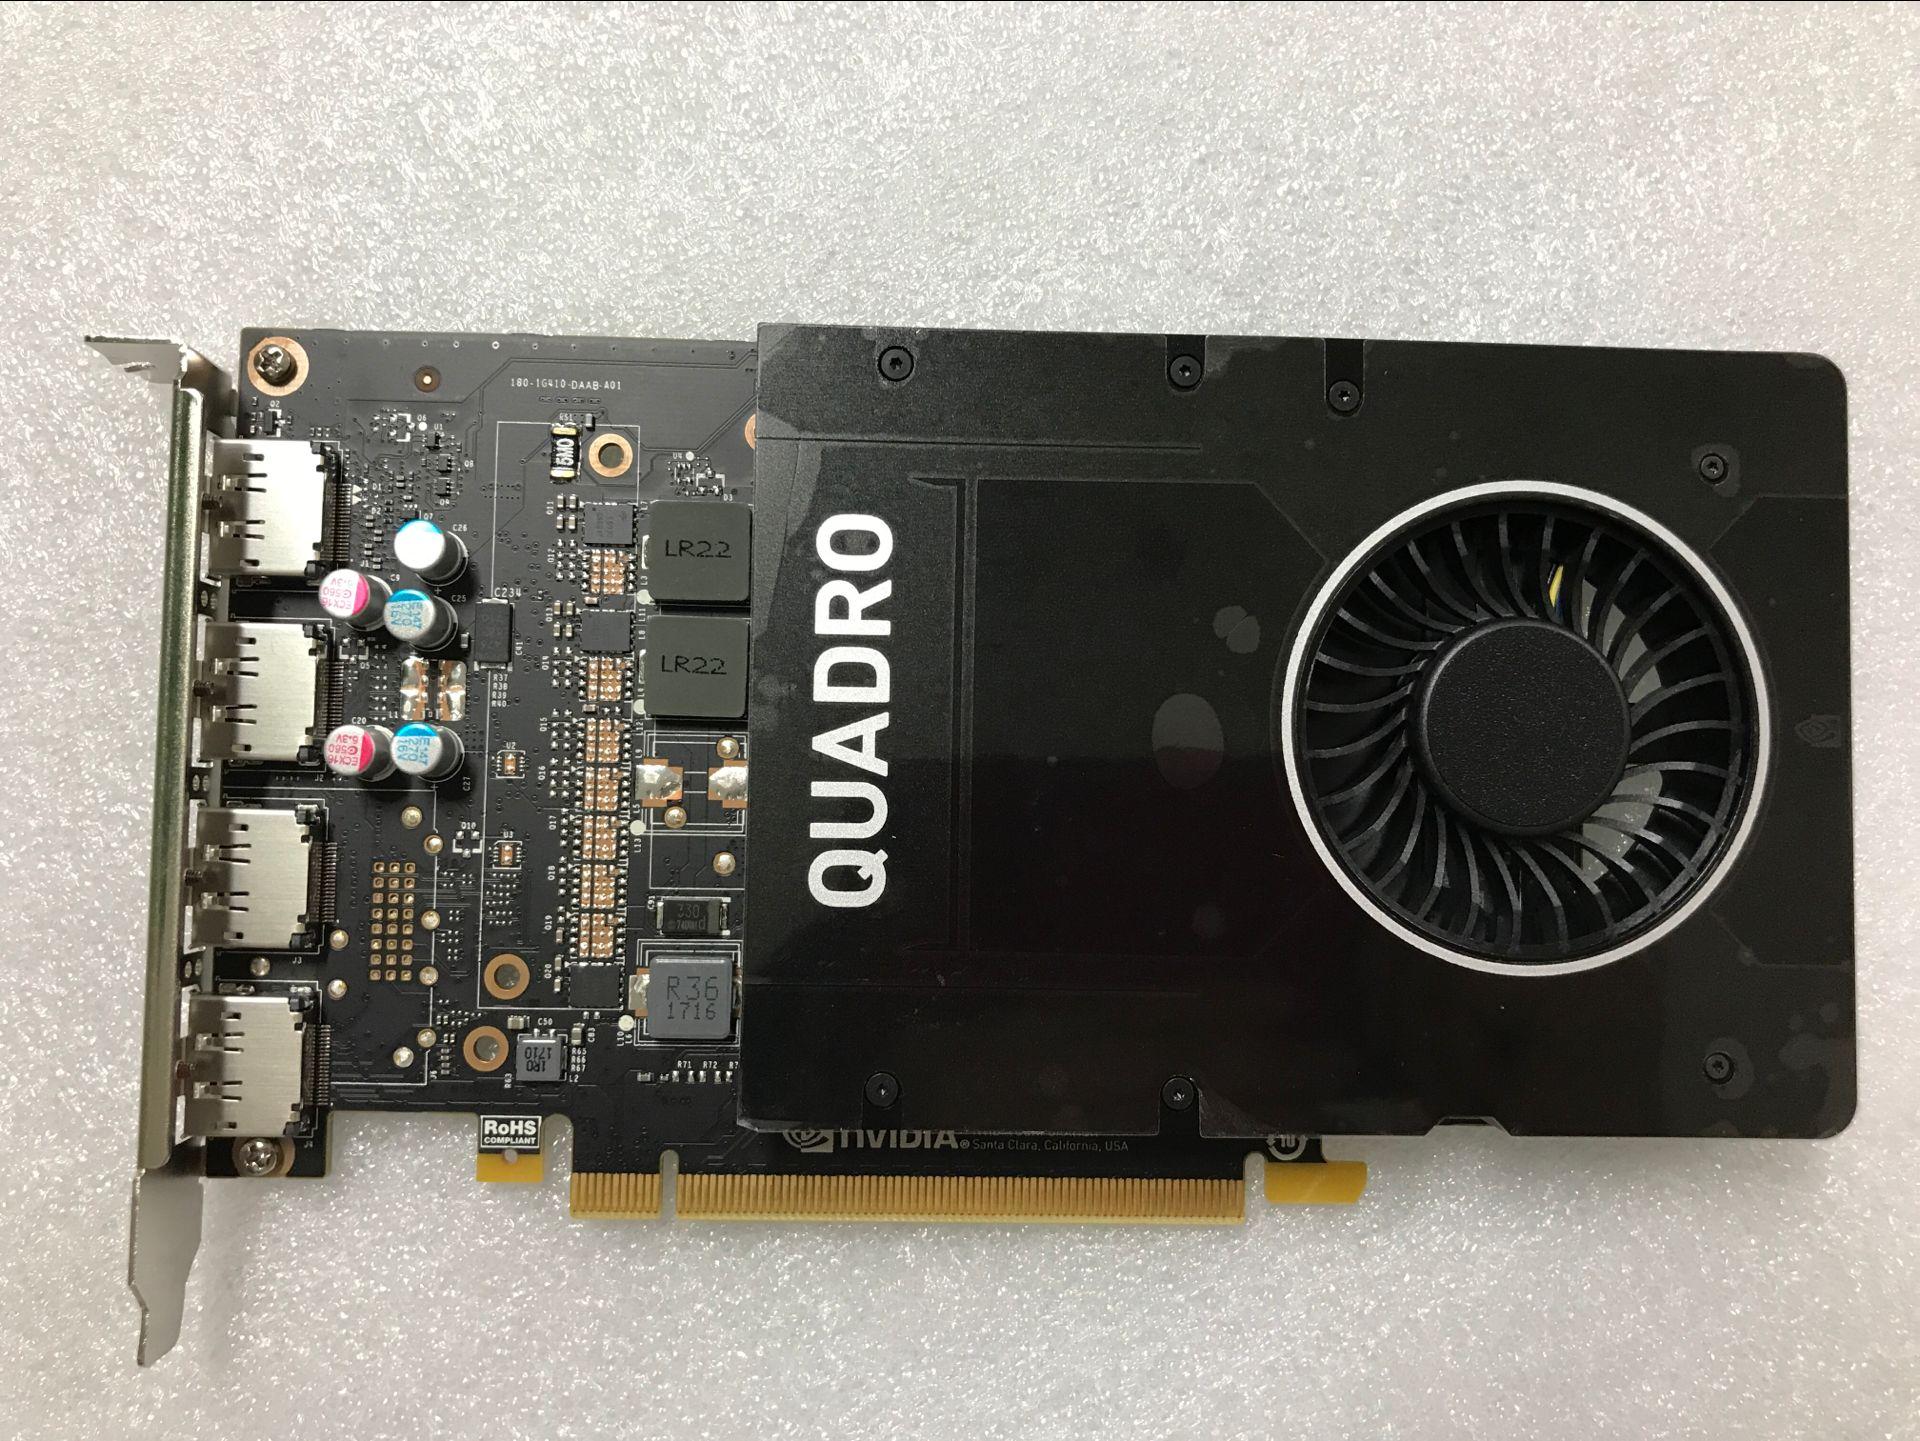 Quadro P2000 5G  Design 3D Modeling Rendering Workstation Professional Graphics Card, Used Original